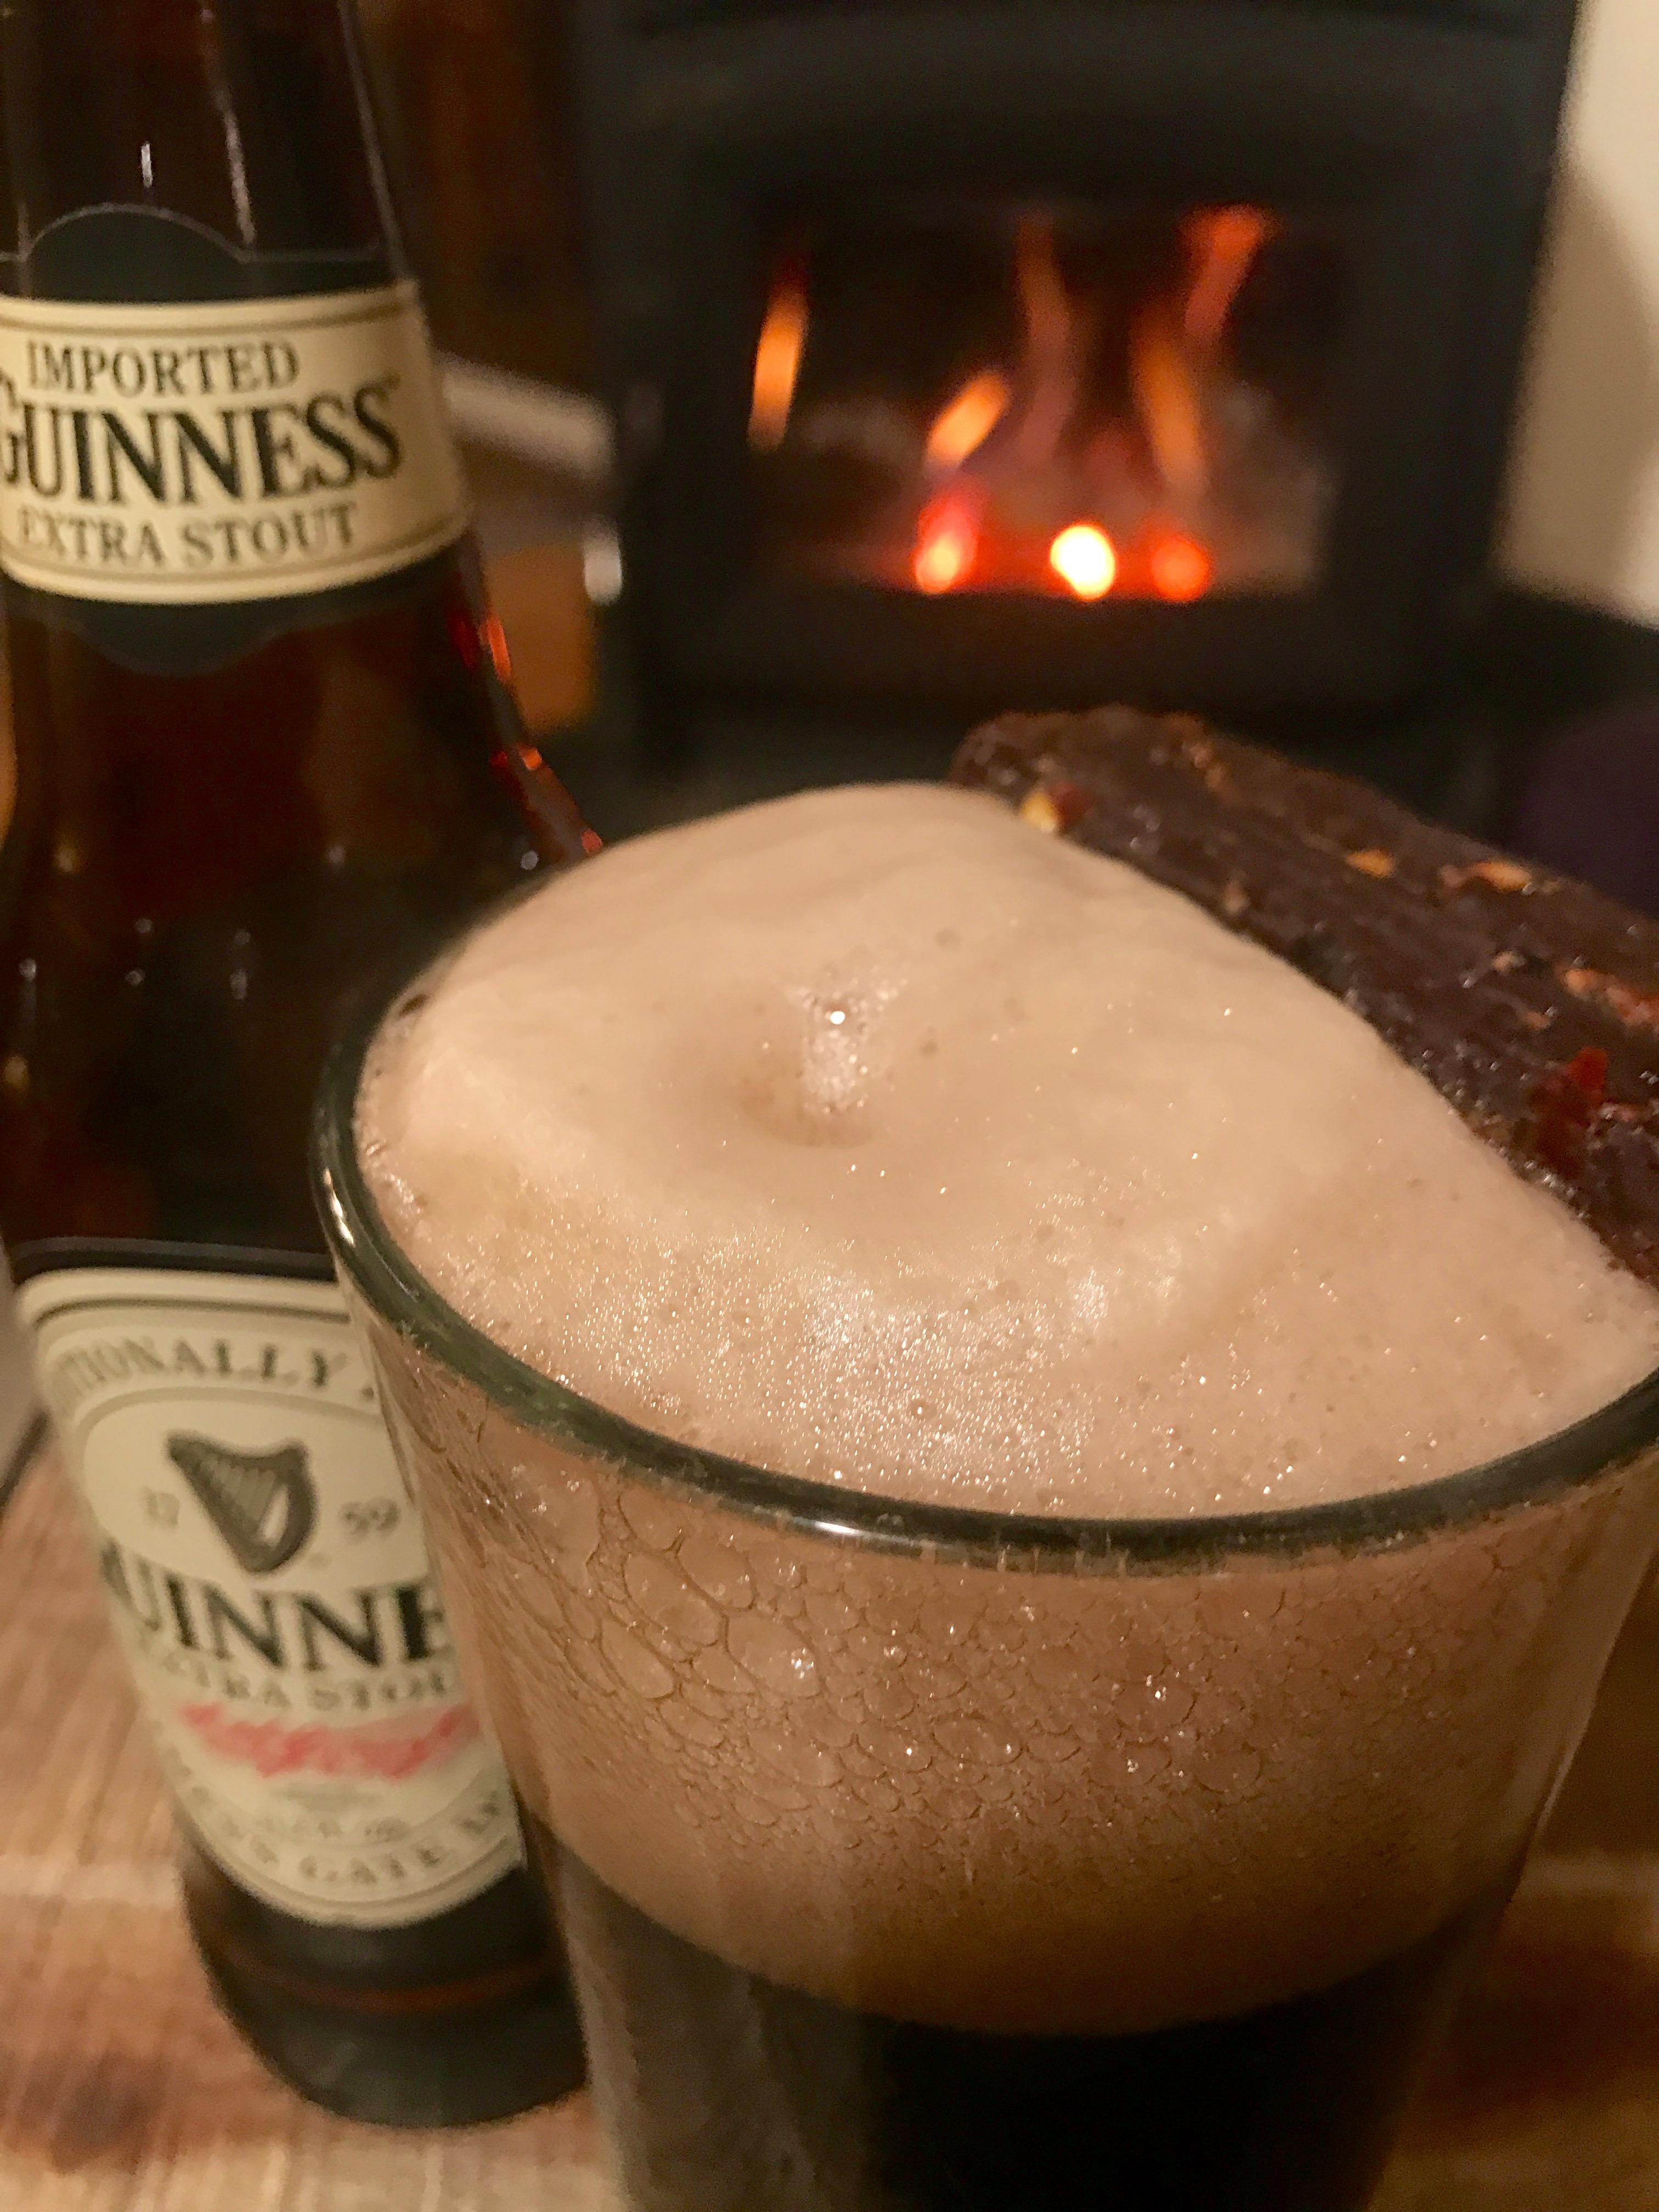 guinness-beer-jerky-pairing-st.-patrick's-day